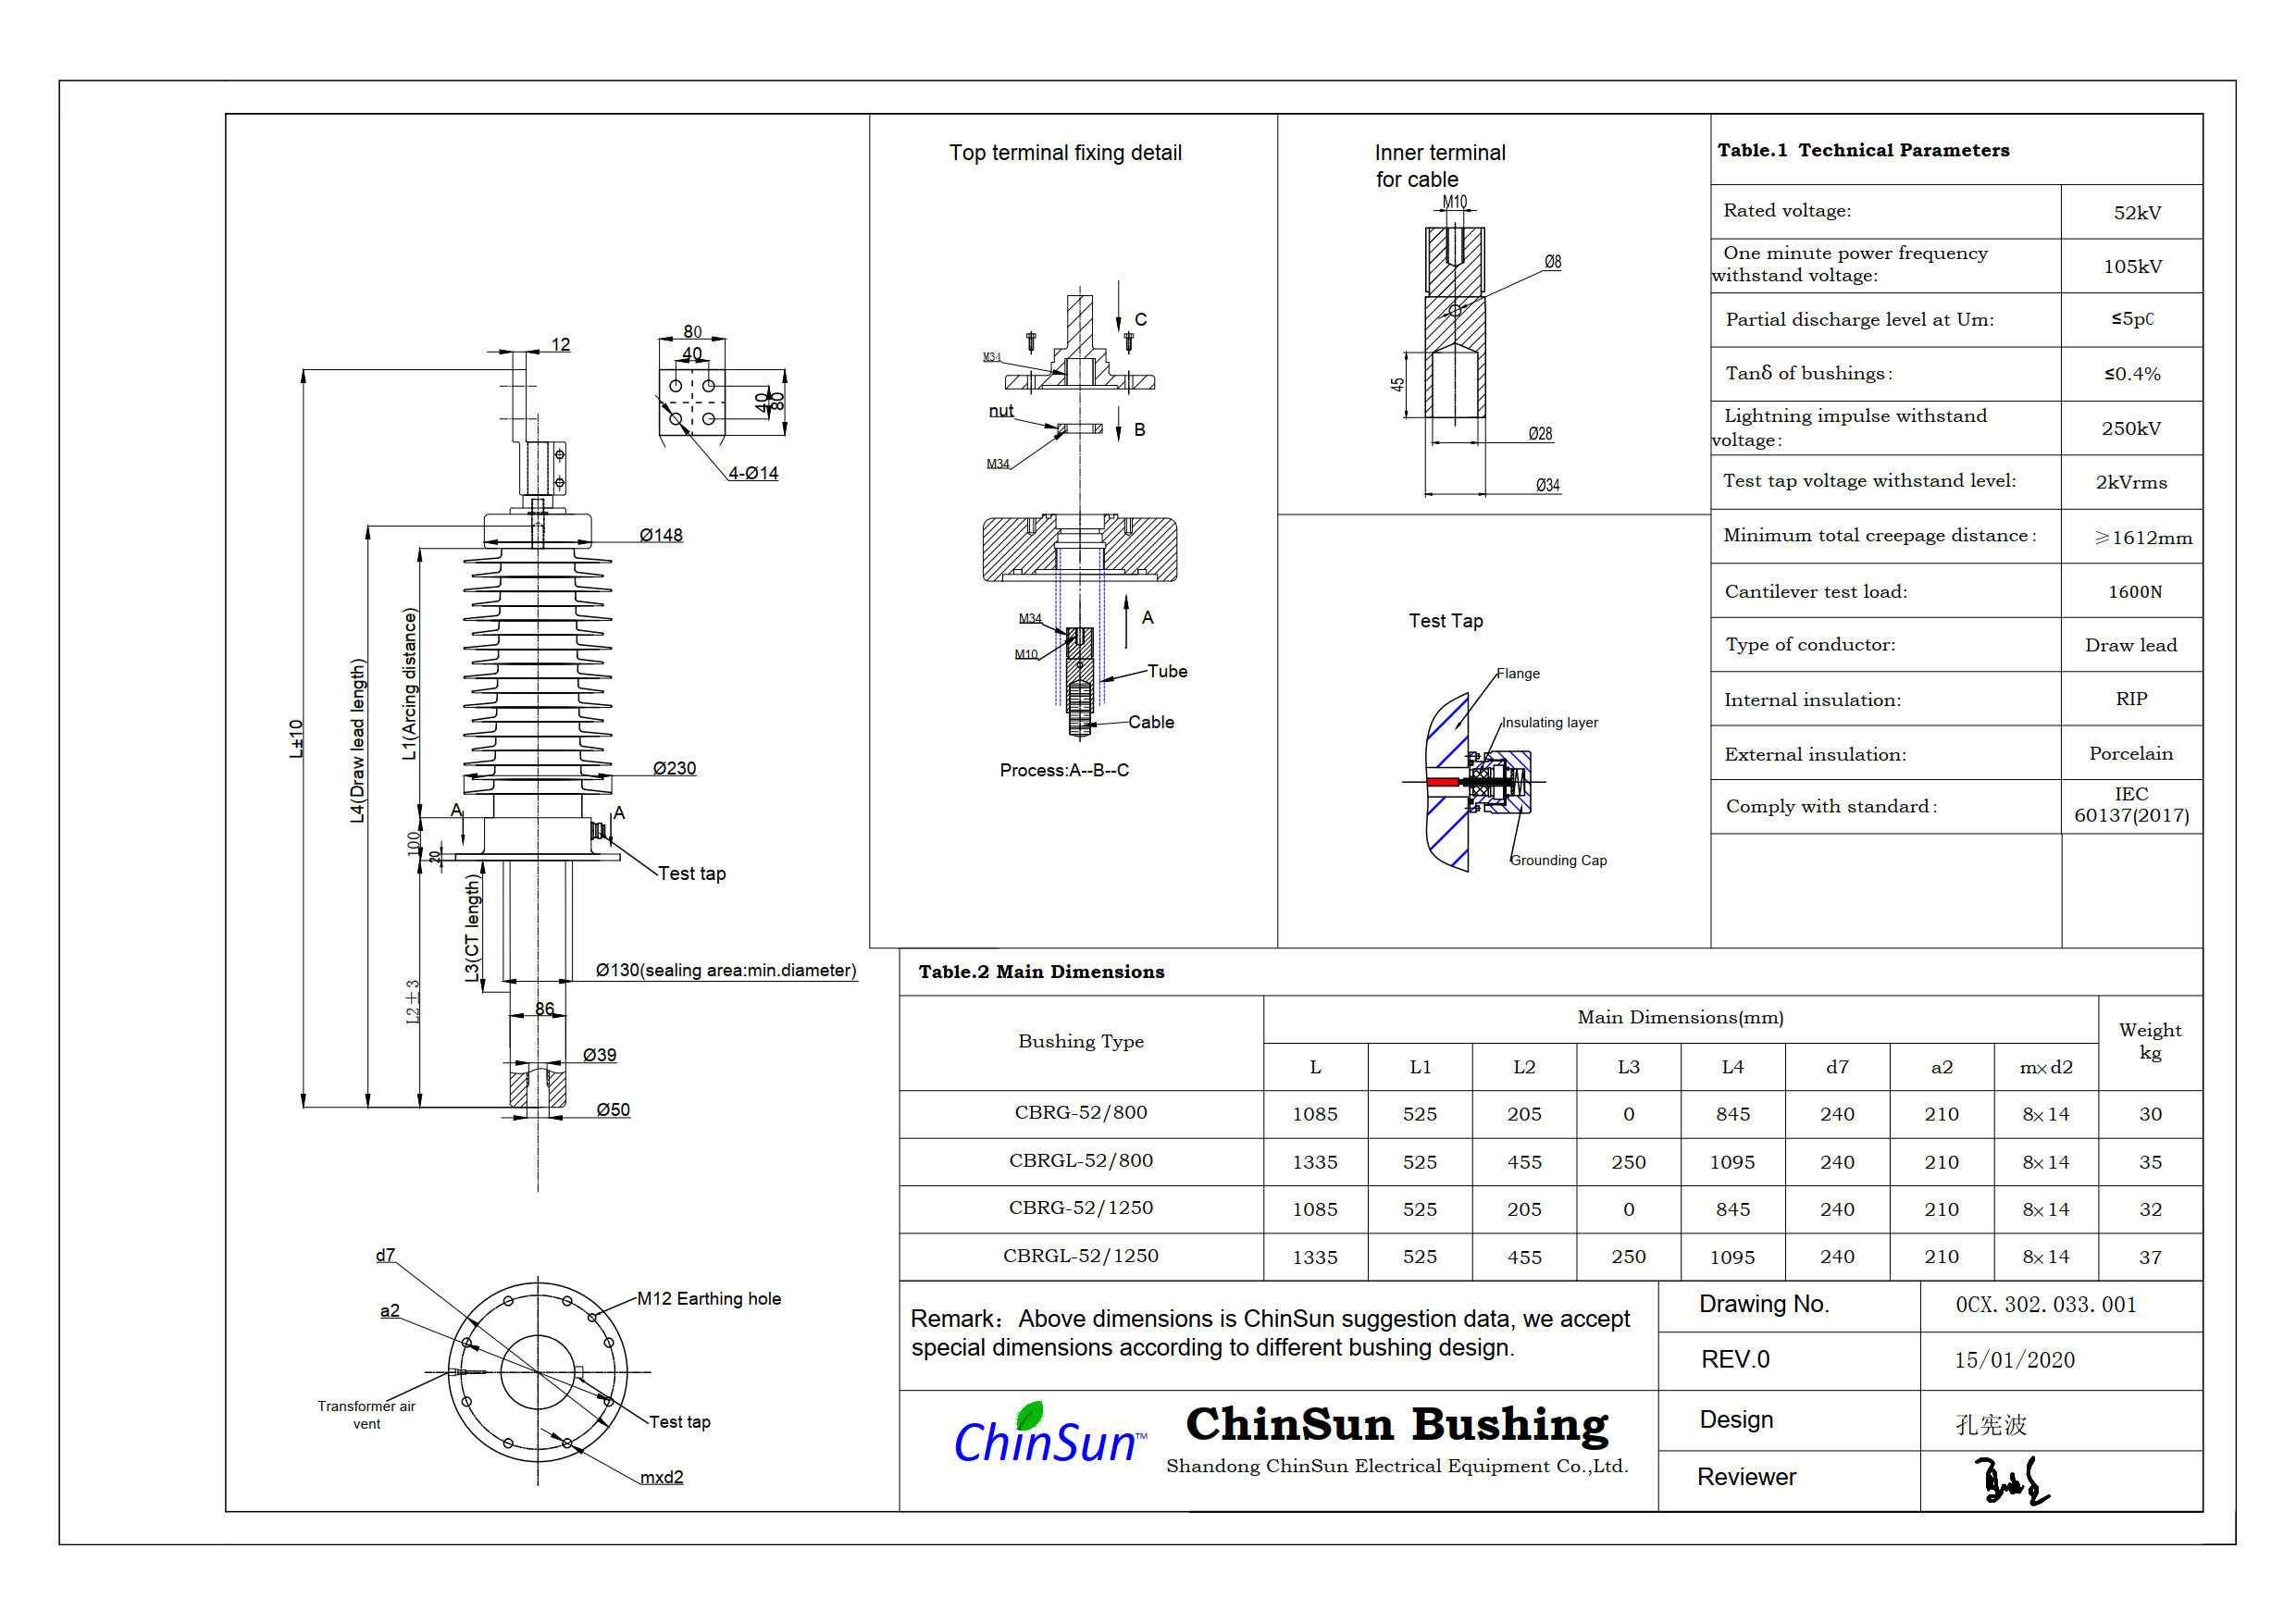 Drawing-transformer bushing-52kV_Porcelain-DL-ChinSun